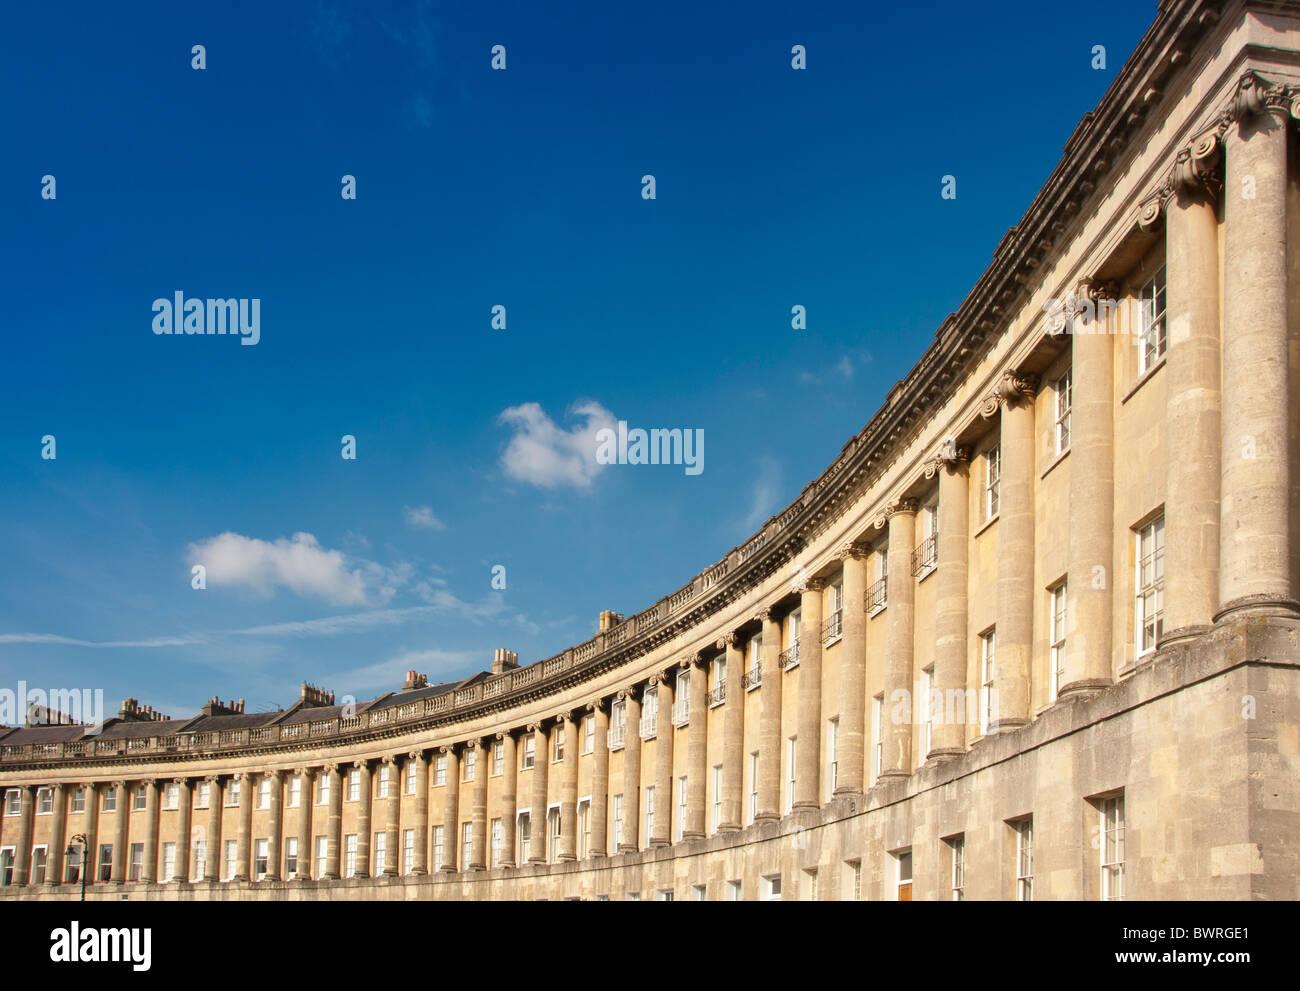 Die Royal Crescent, Bath, England. Stockbild